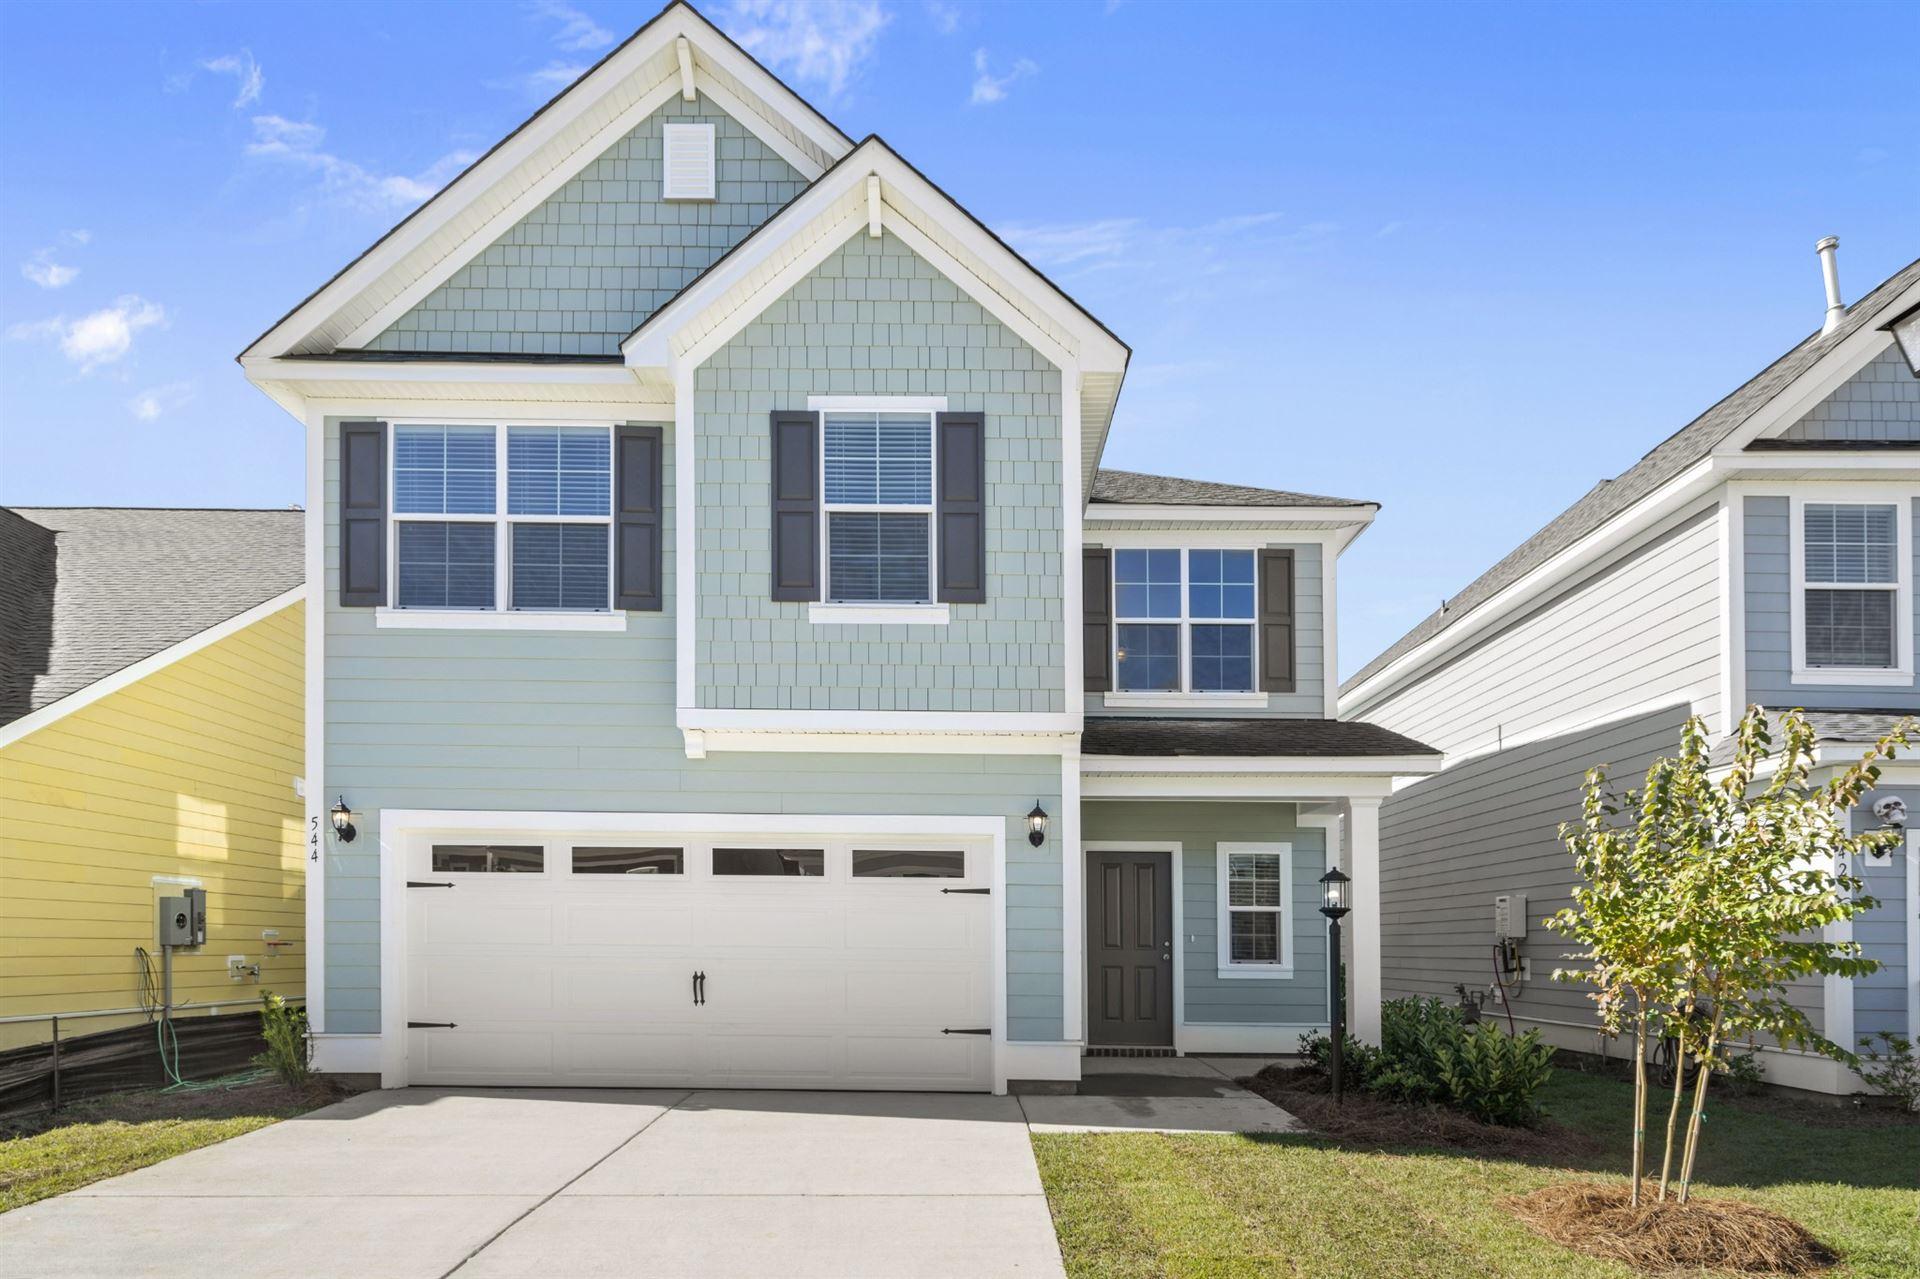 Photo of 3534 Lafave Ln, Murfreesboro, TN 37129 (MLS # 2251545)